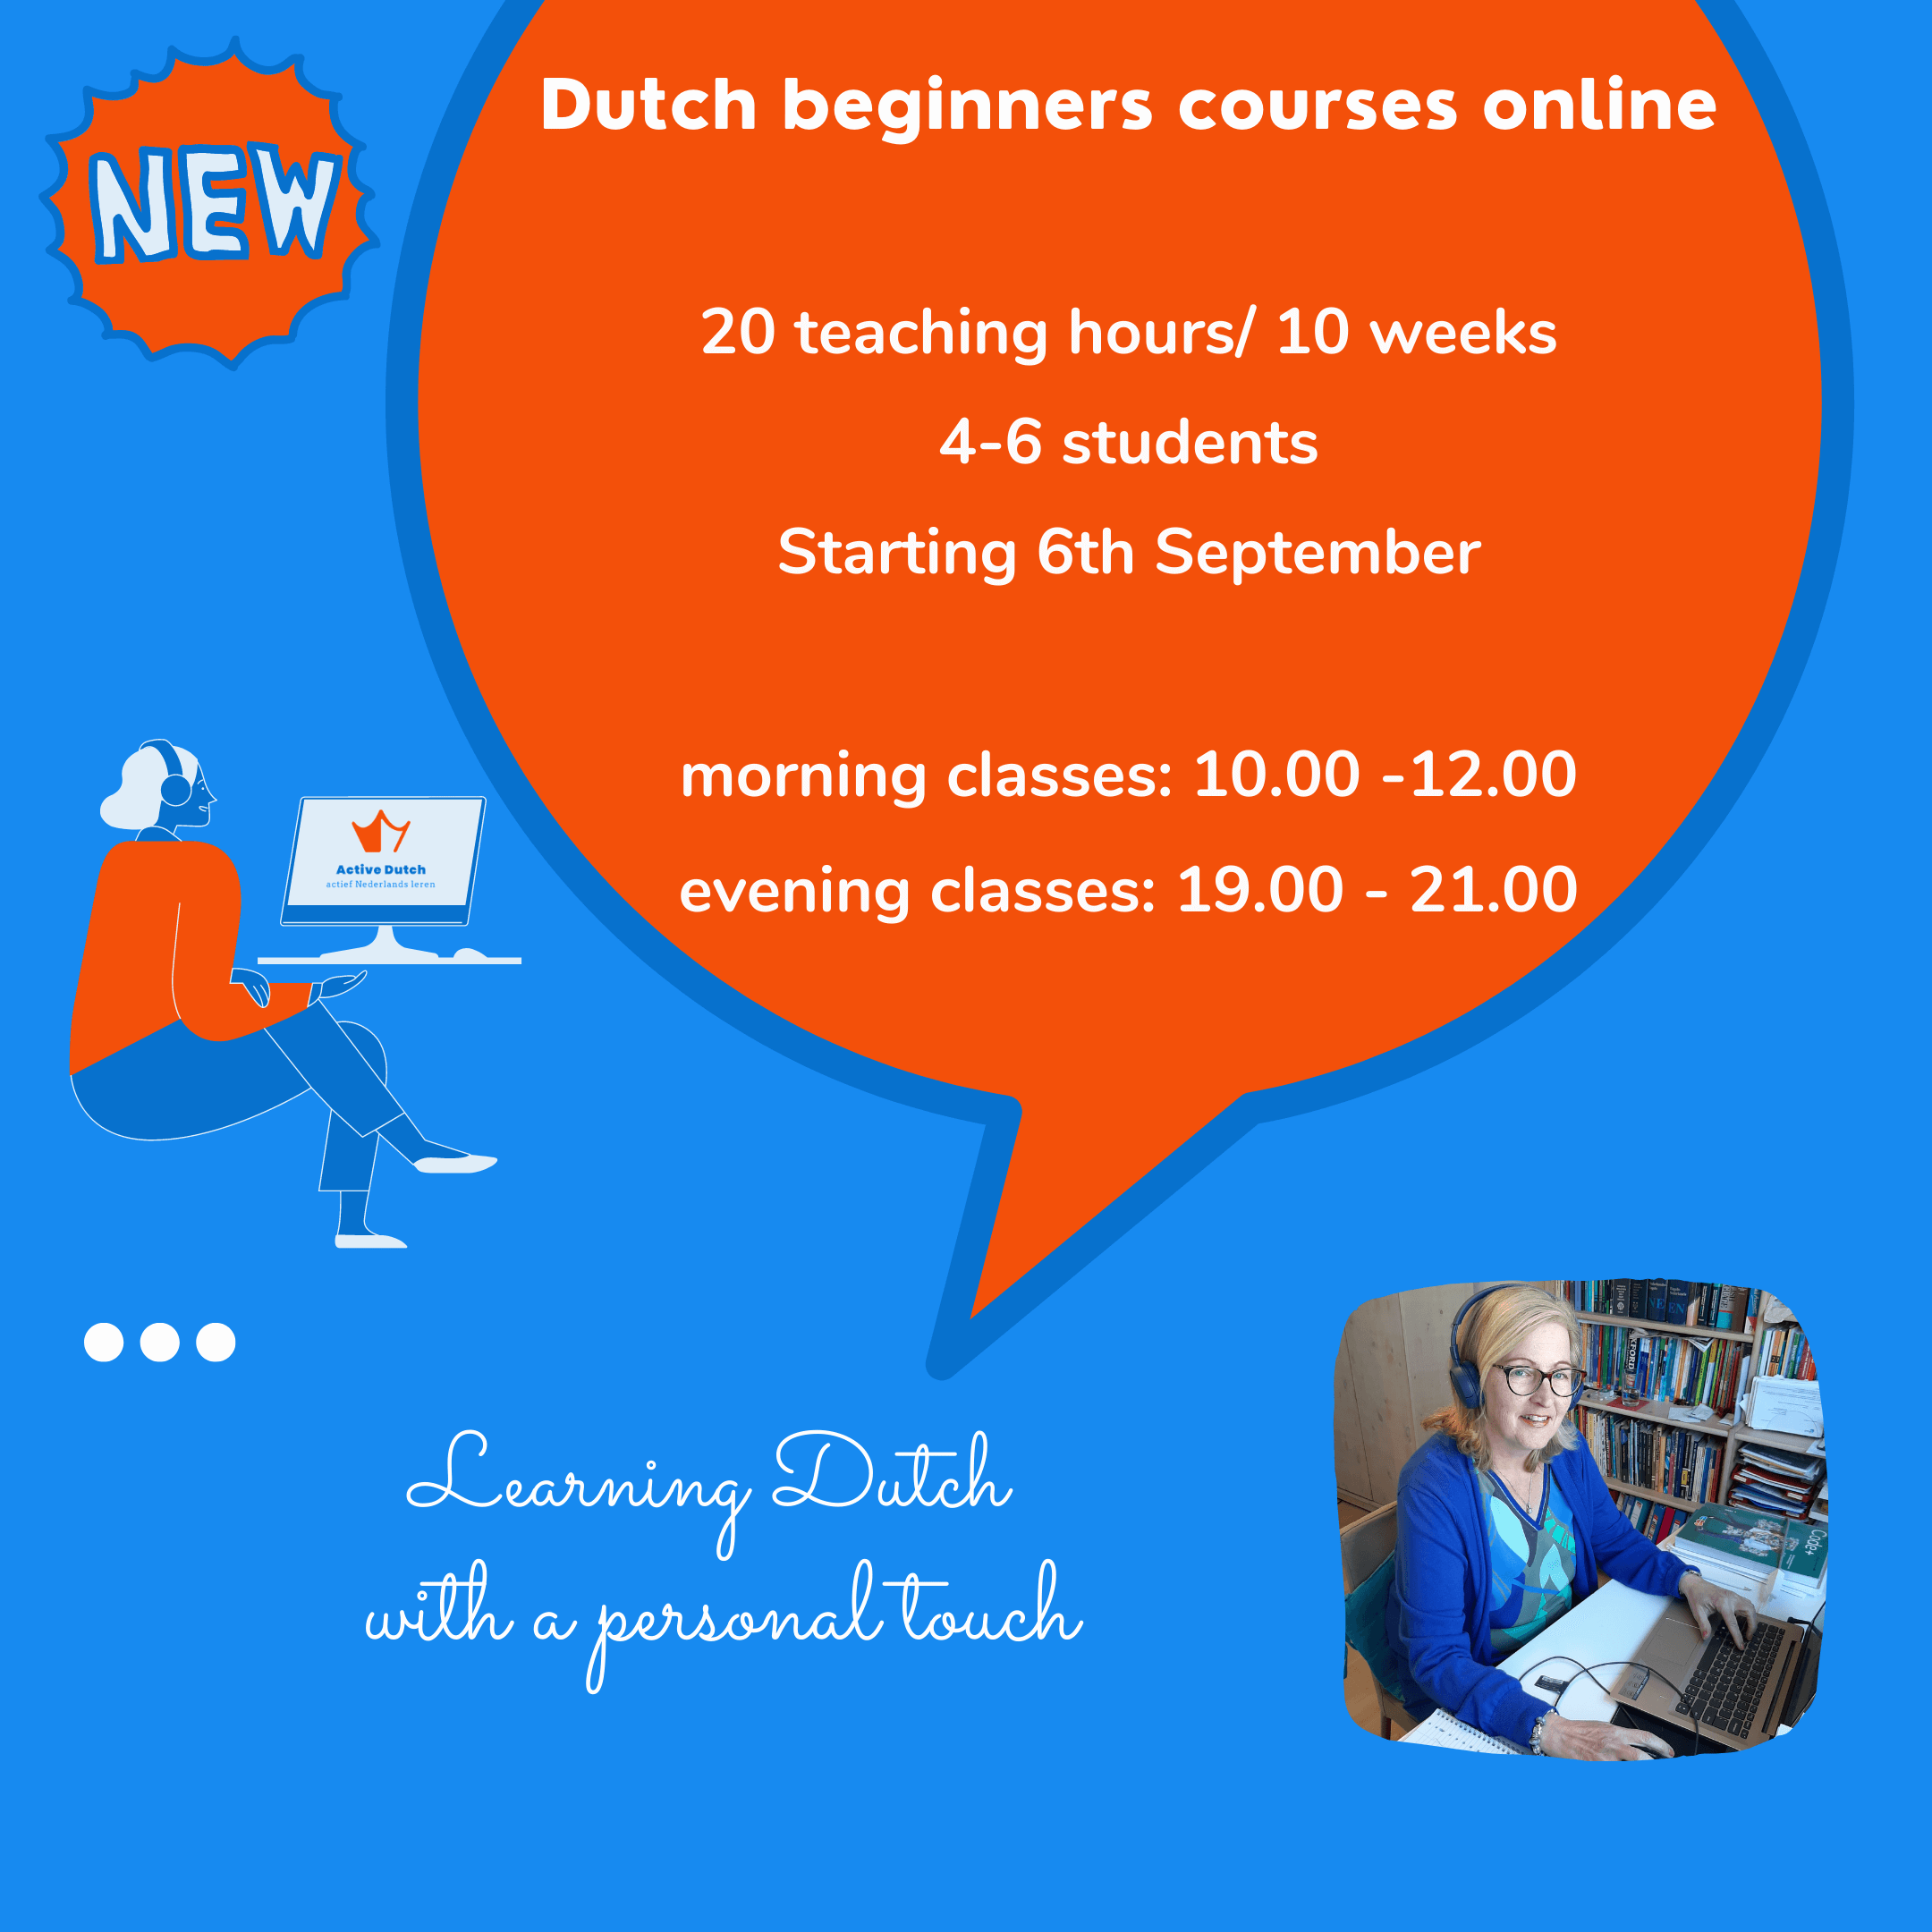 Dutch beginners courses online - Active Dutch